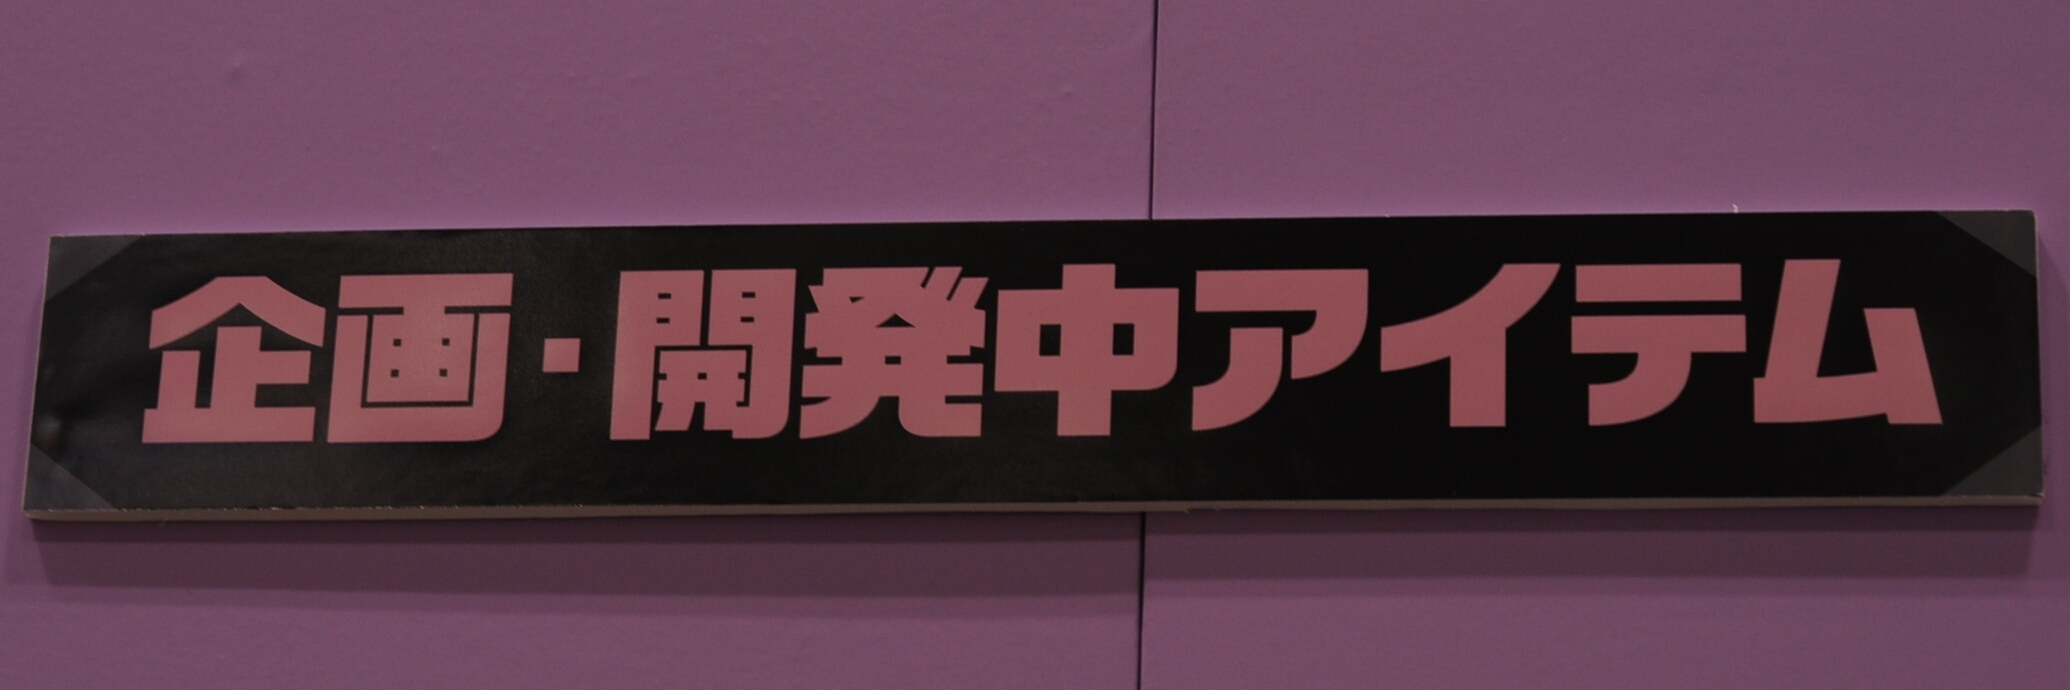 DSC_0691_01.jpg